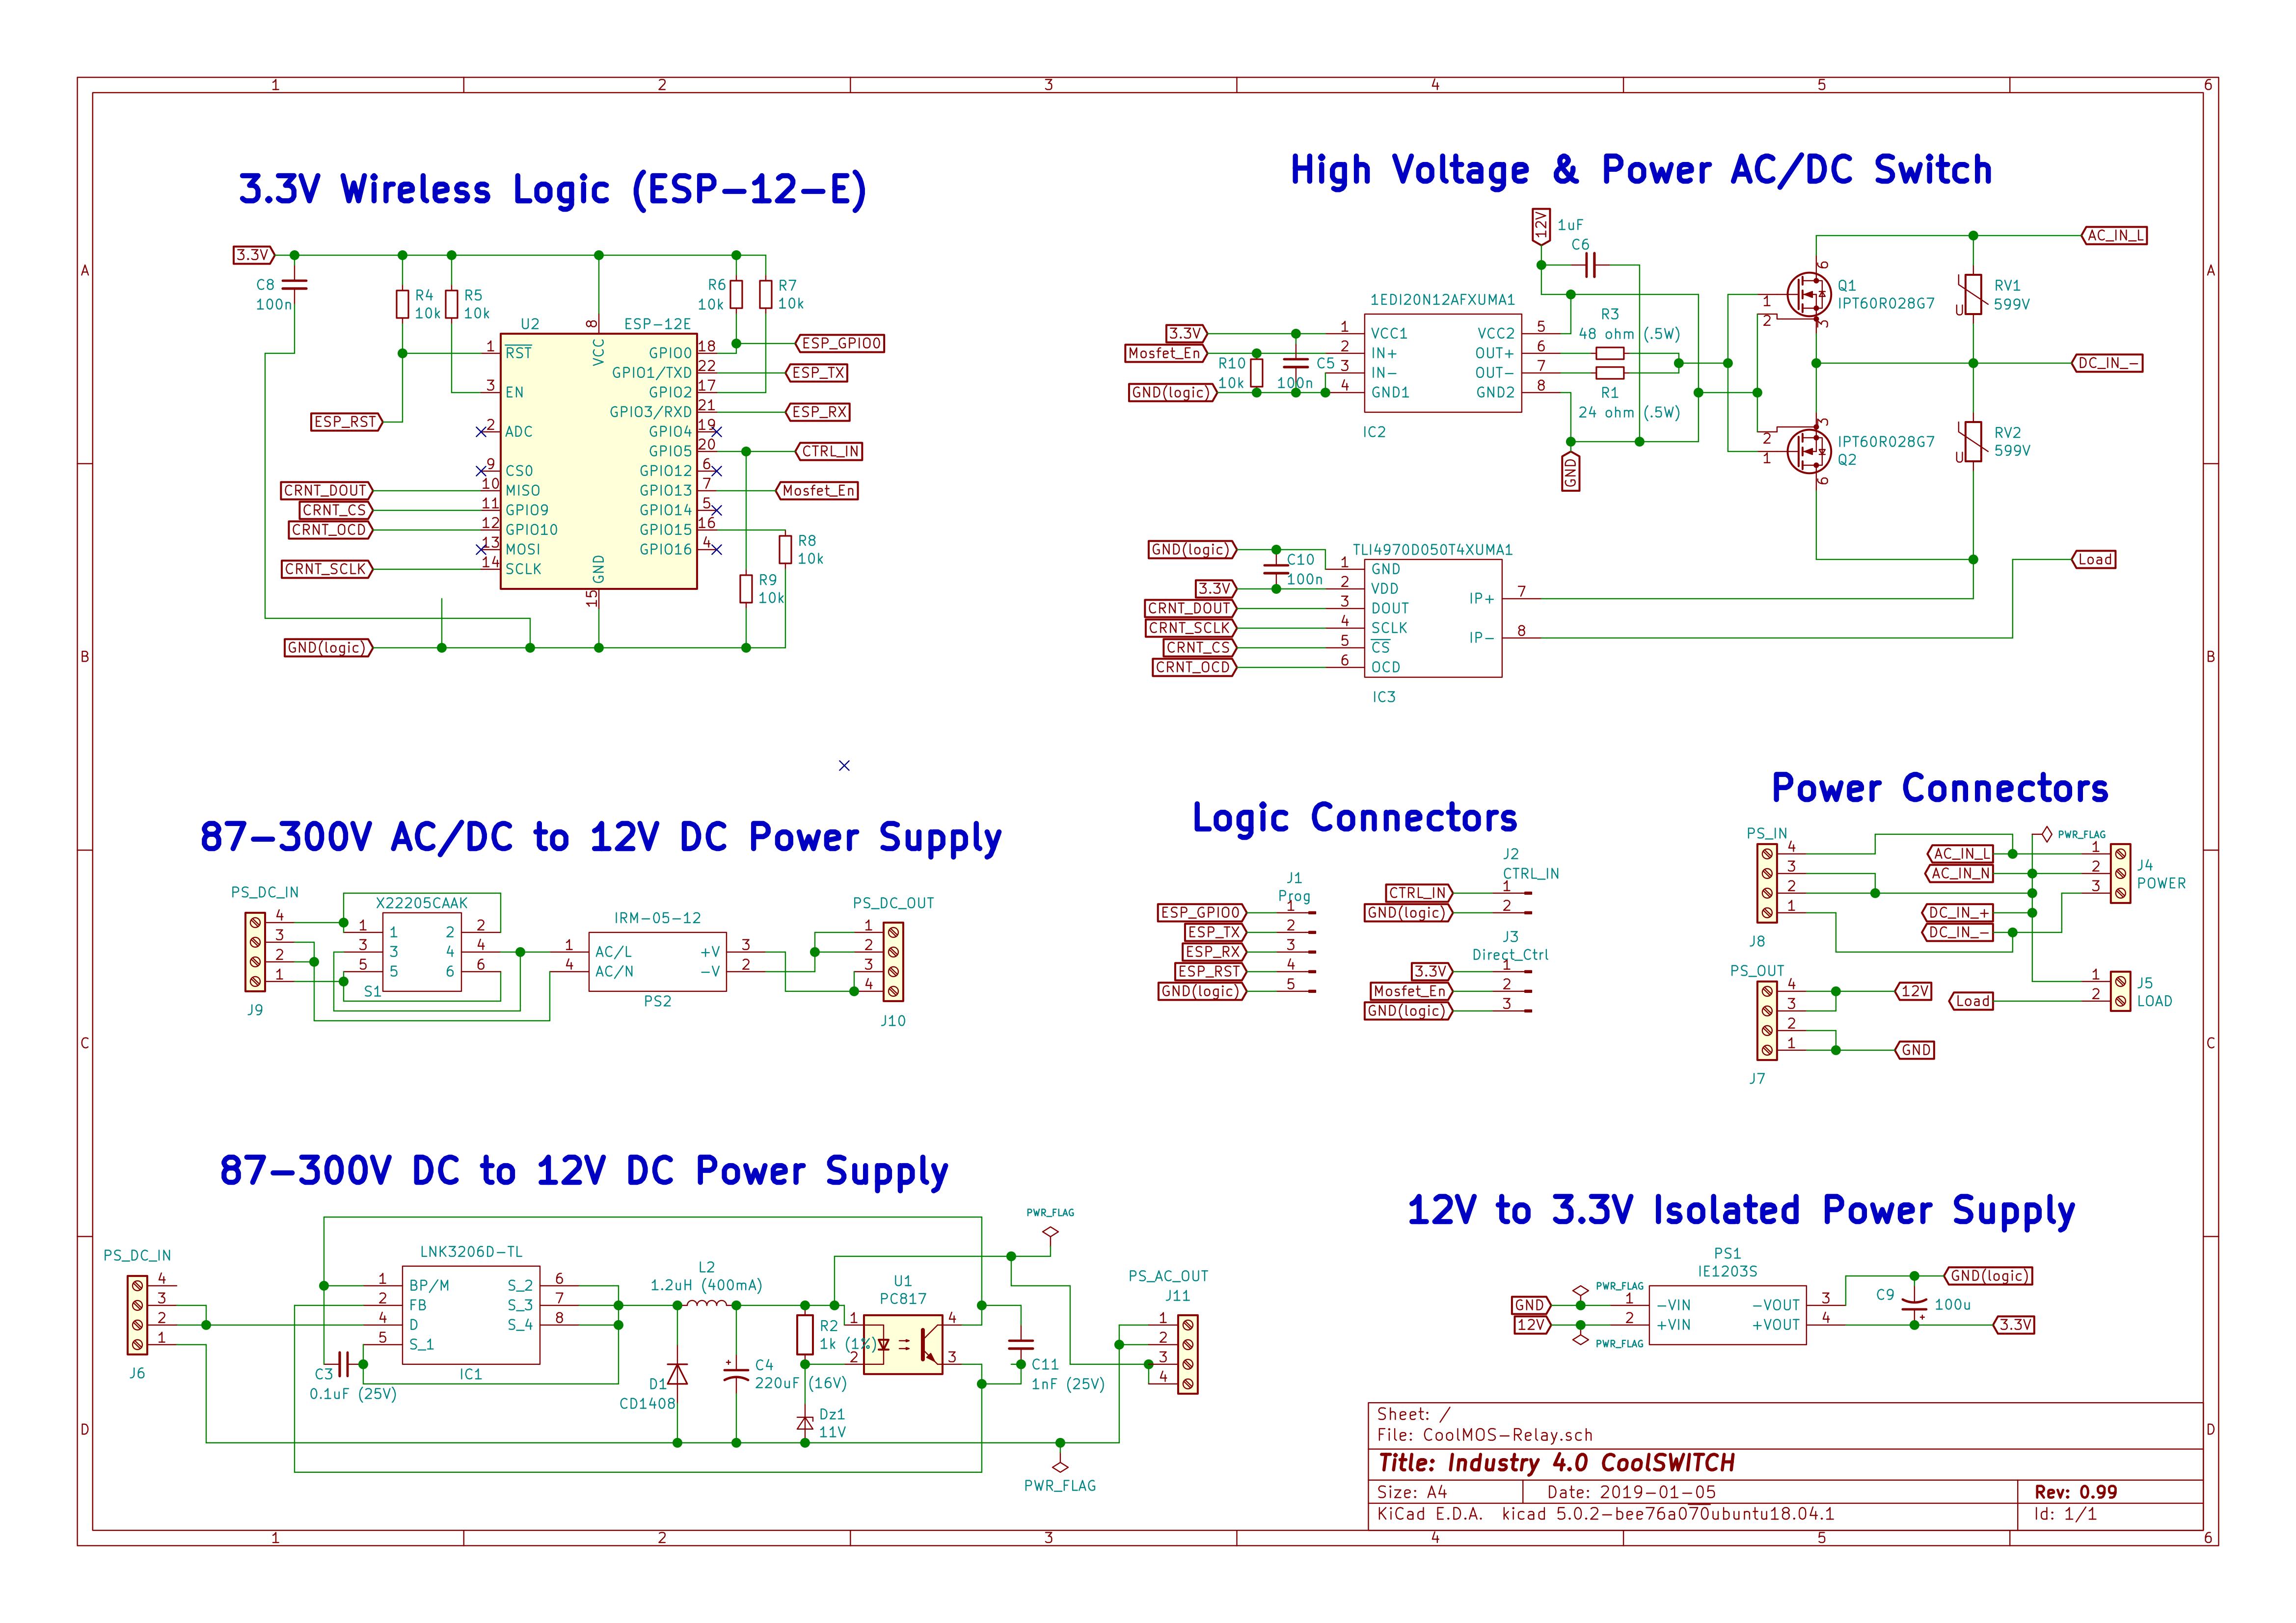 Coolswitch schematics naxhlrdtz5